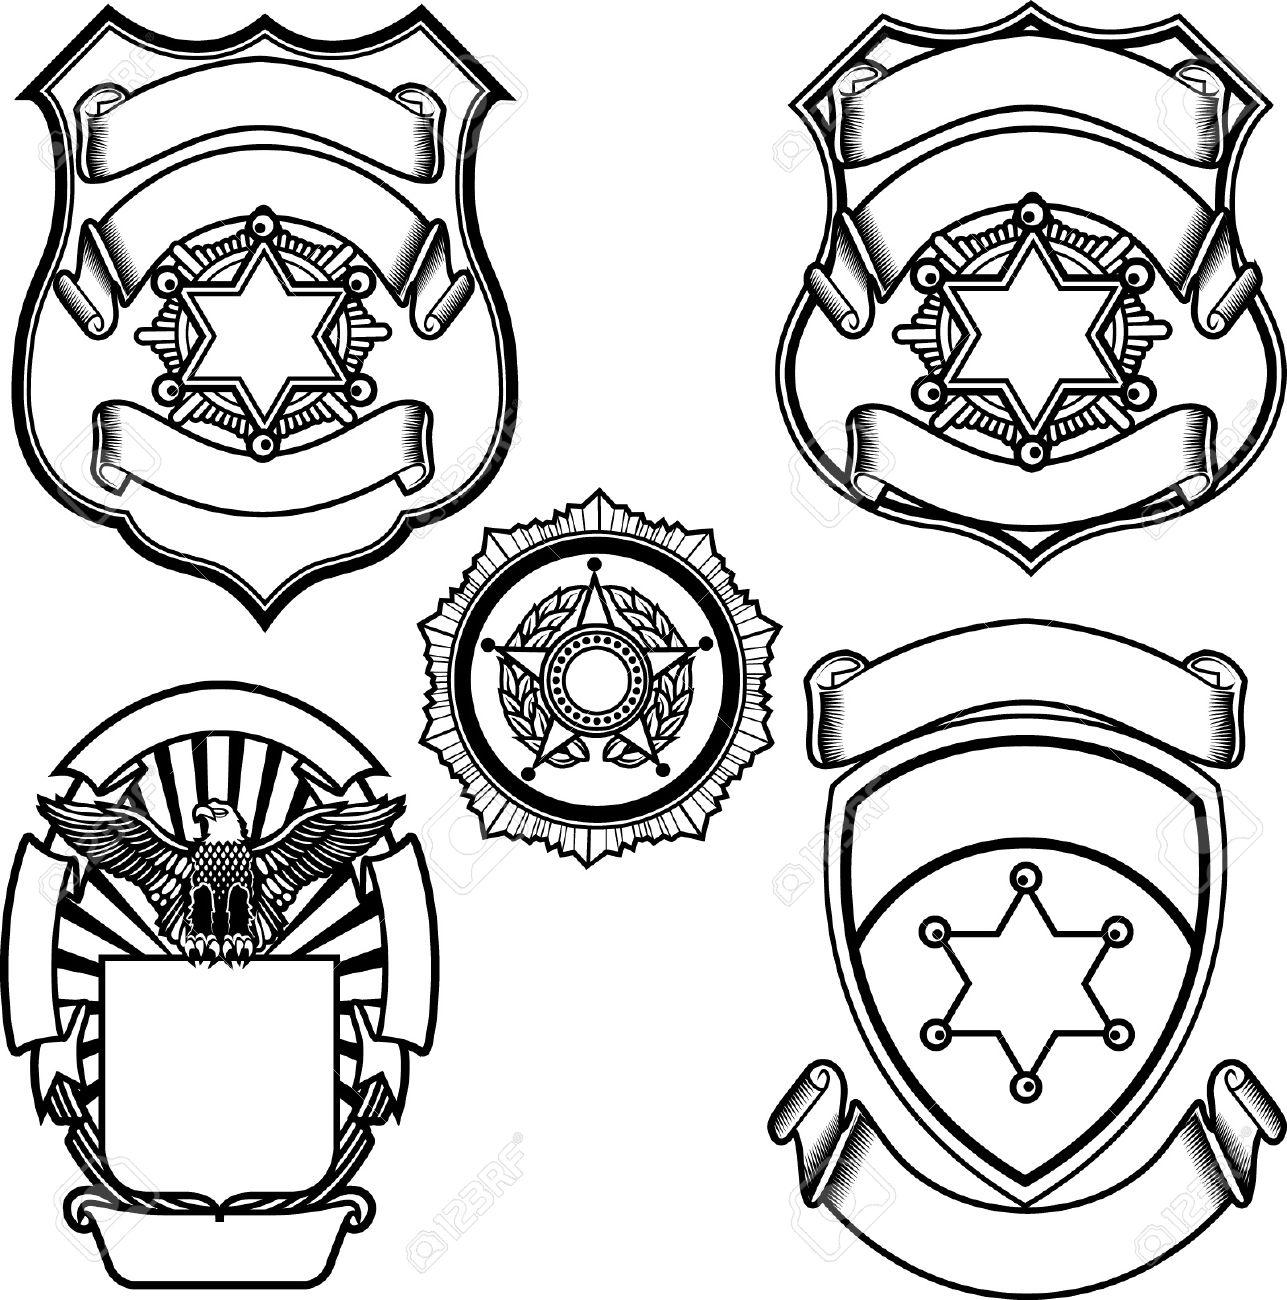 Free Printable Police Badge Template